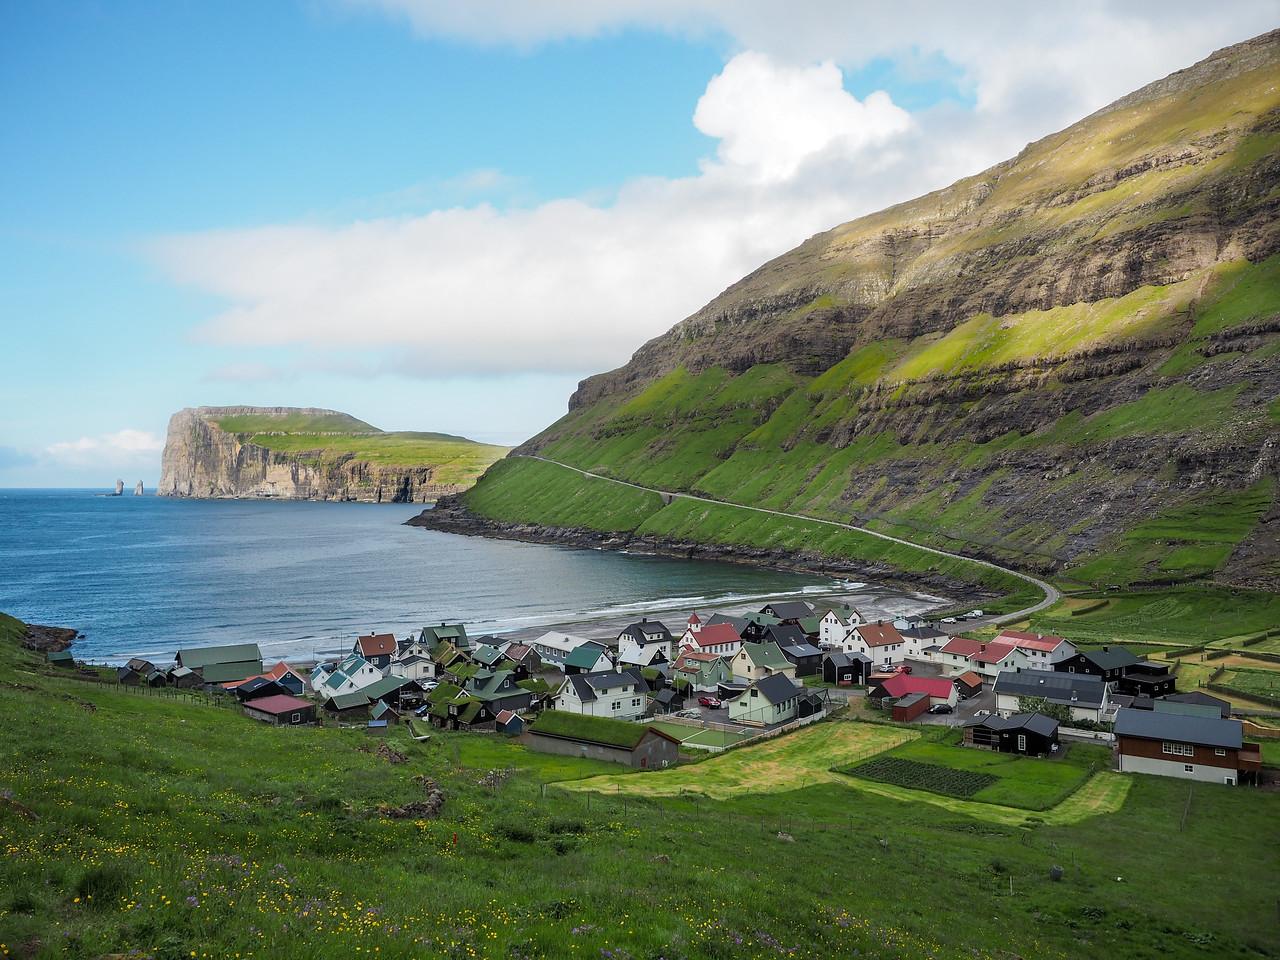 The village of Tjørnuvík in the Faroe Islands